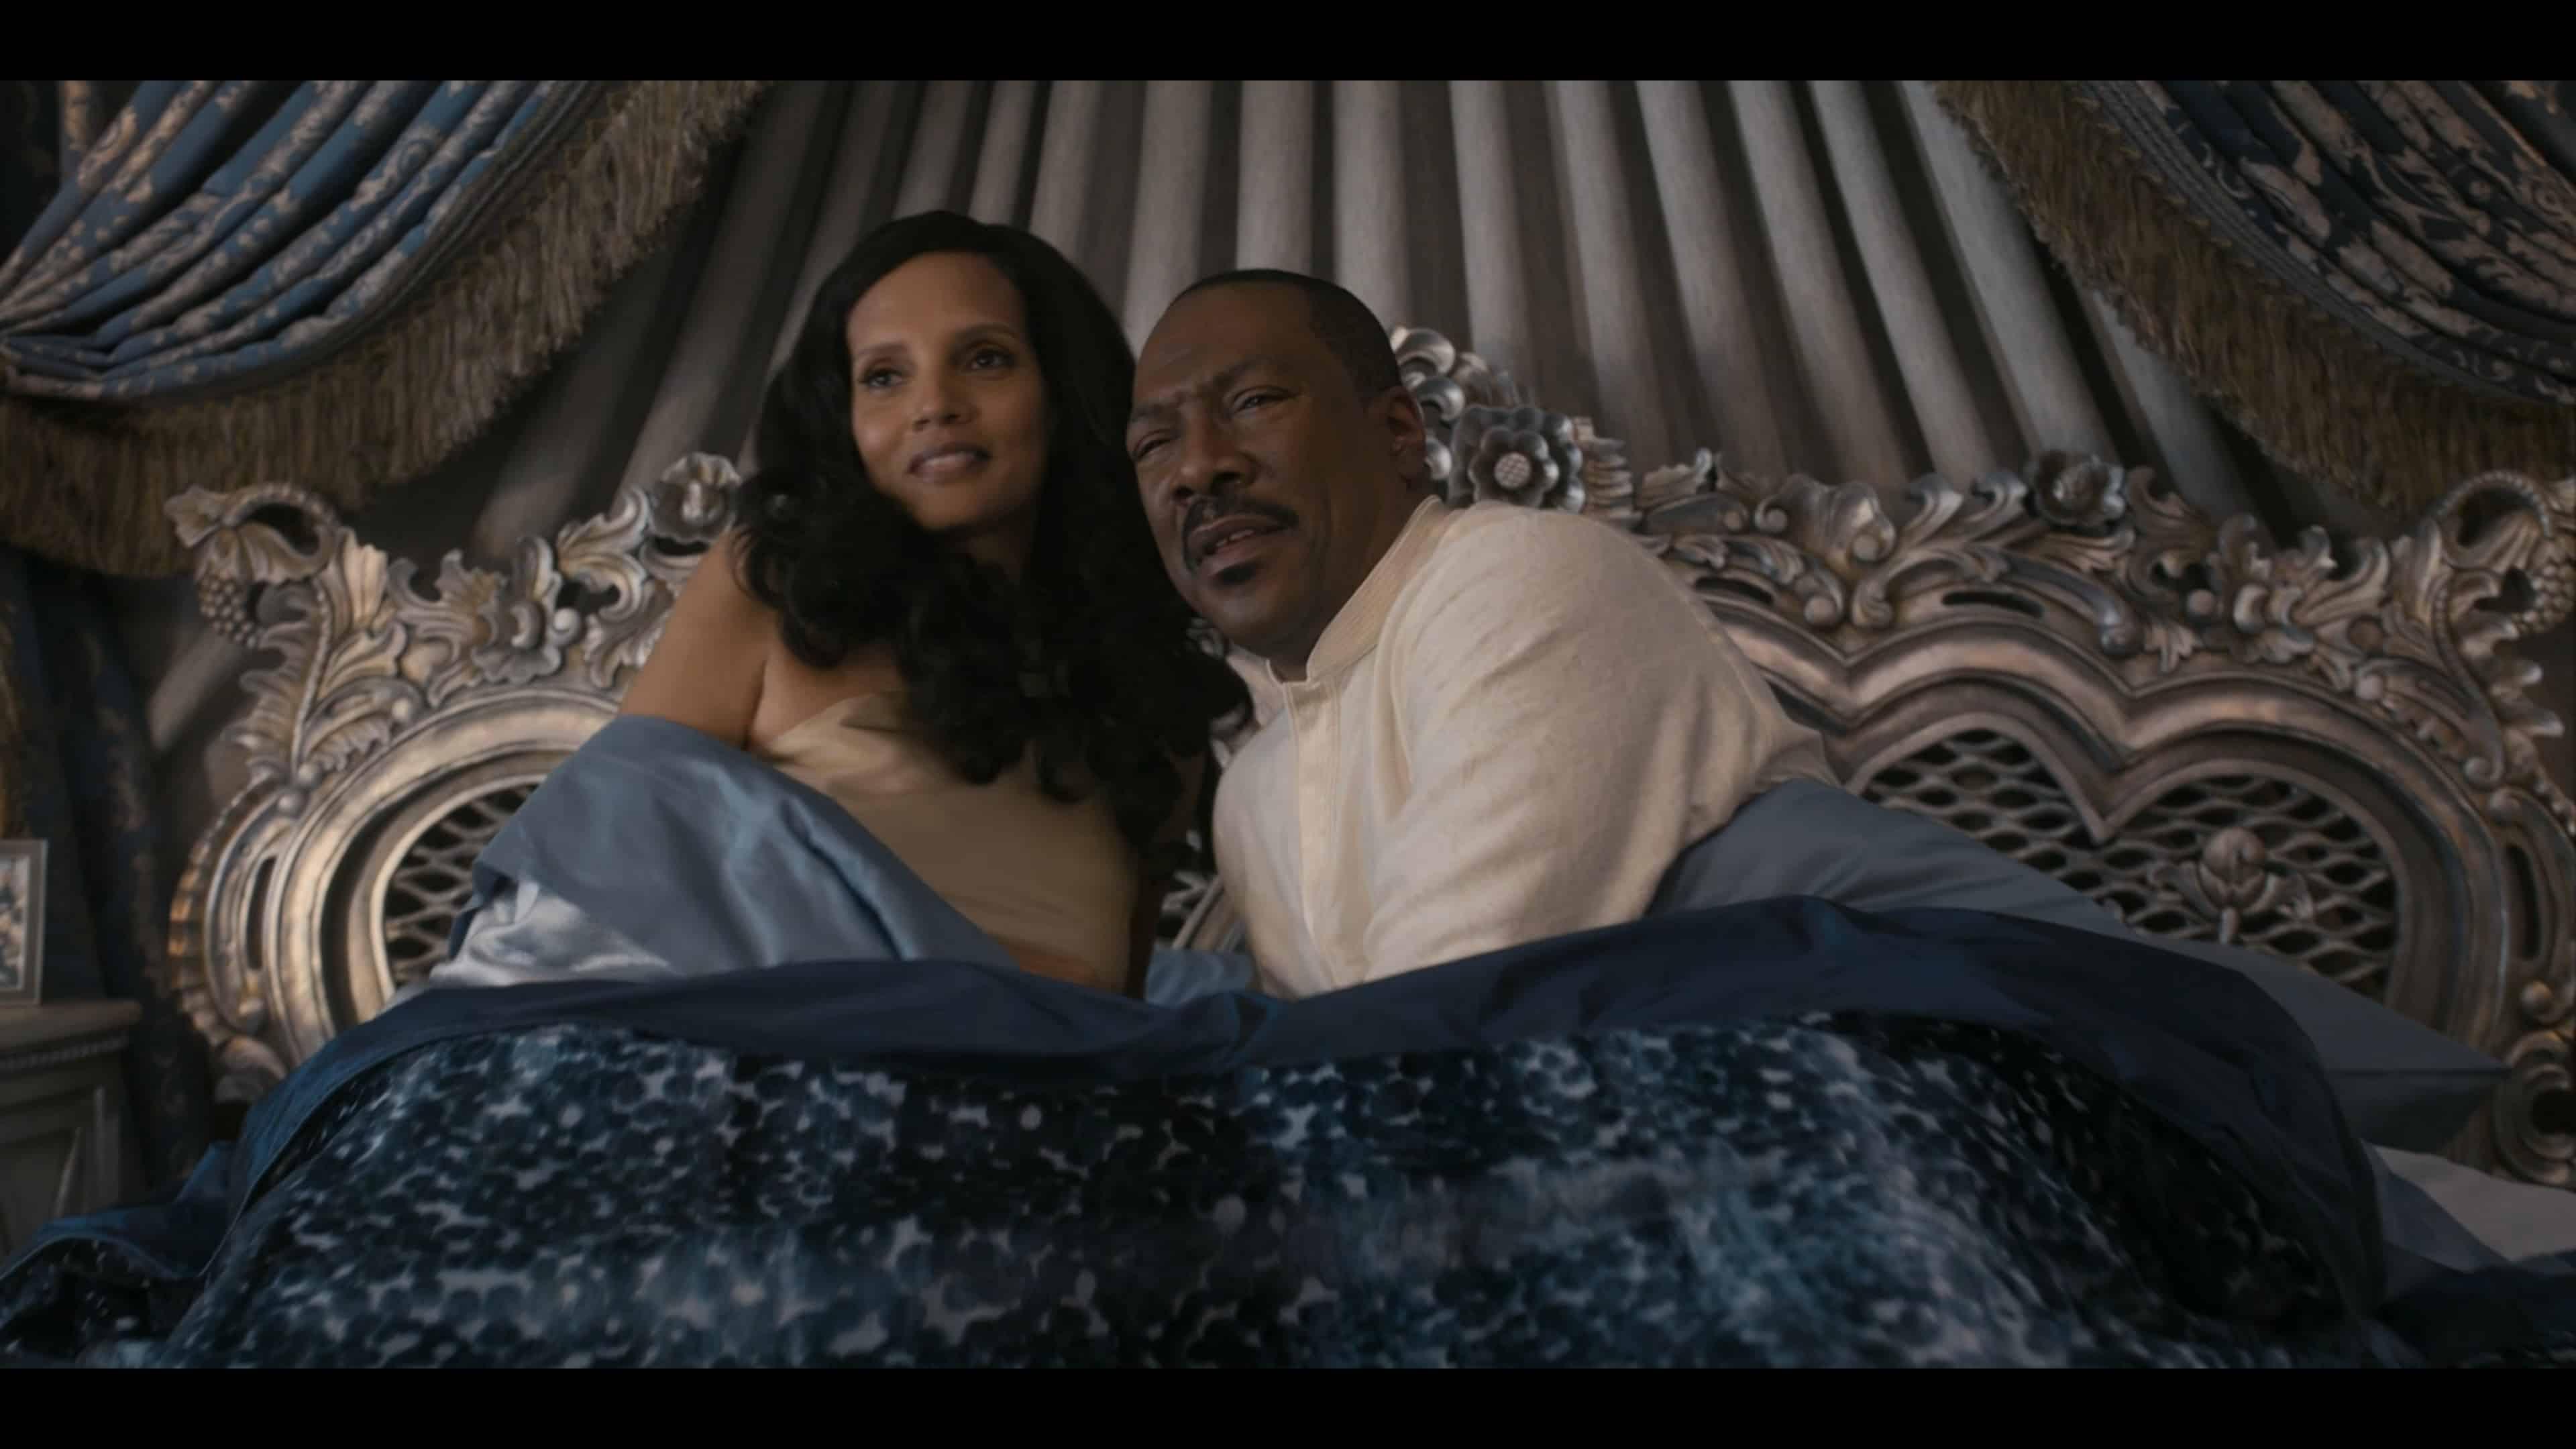 Lisa (Shari Headley) and Akeem (Eddie Murphy) in bed together